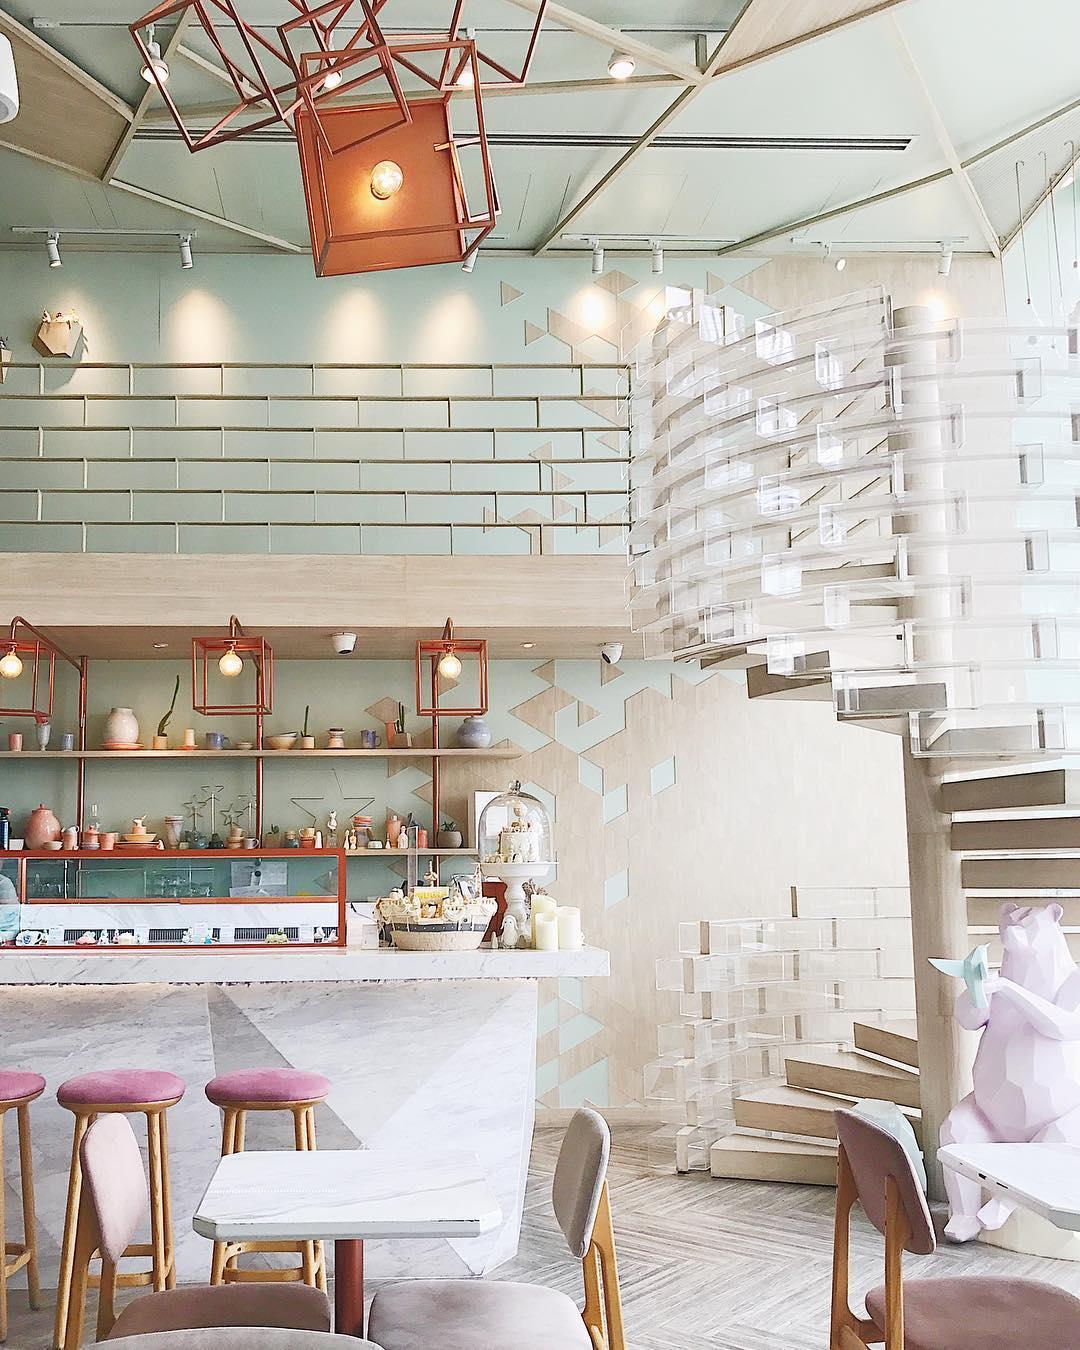 bangkok hipster cafe - shugaa